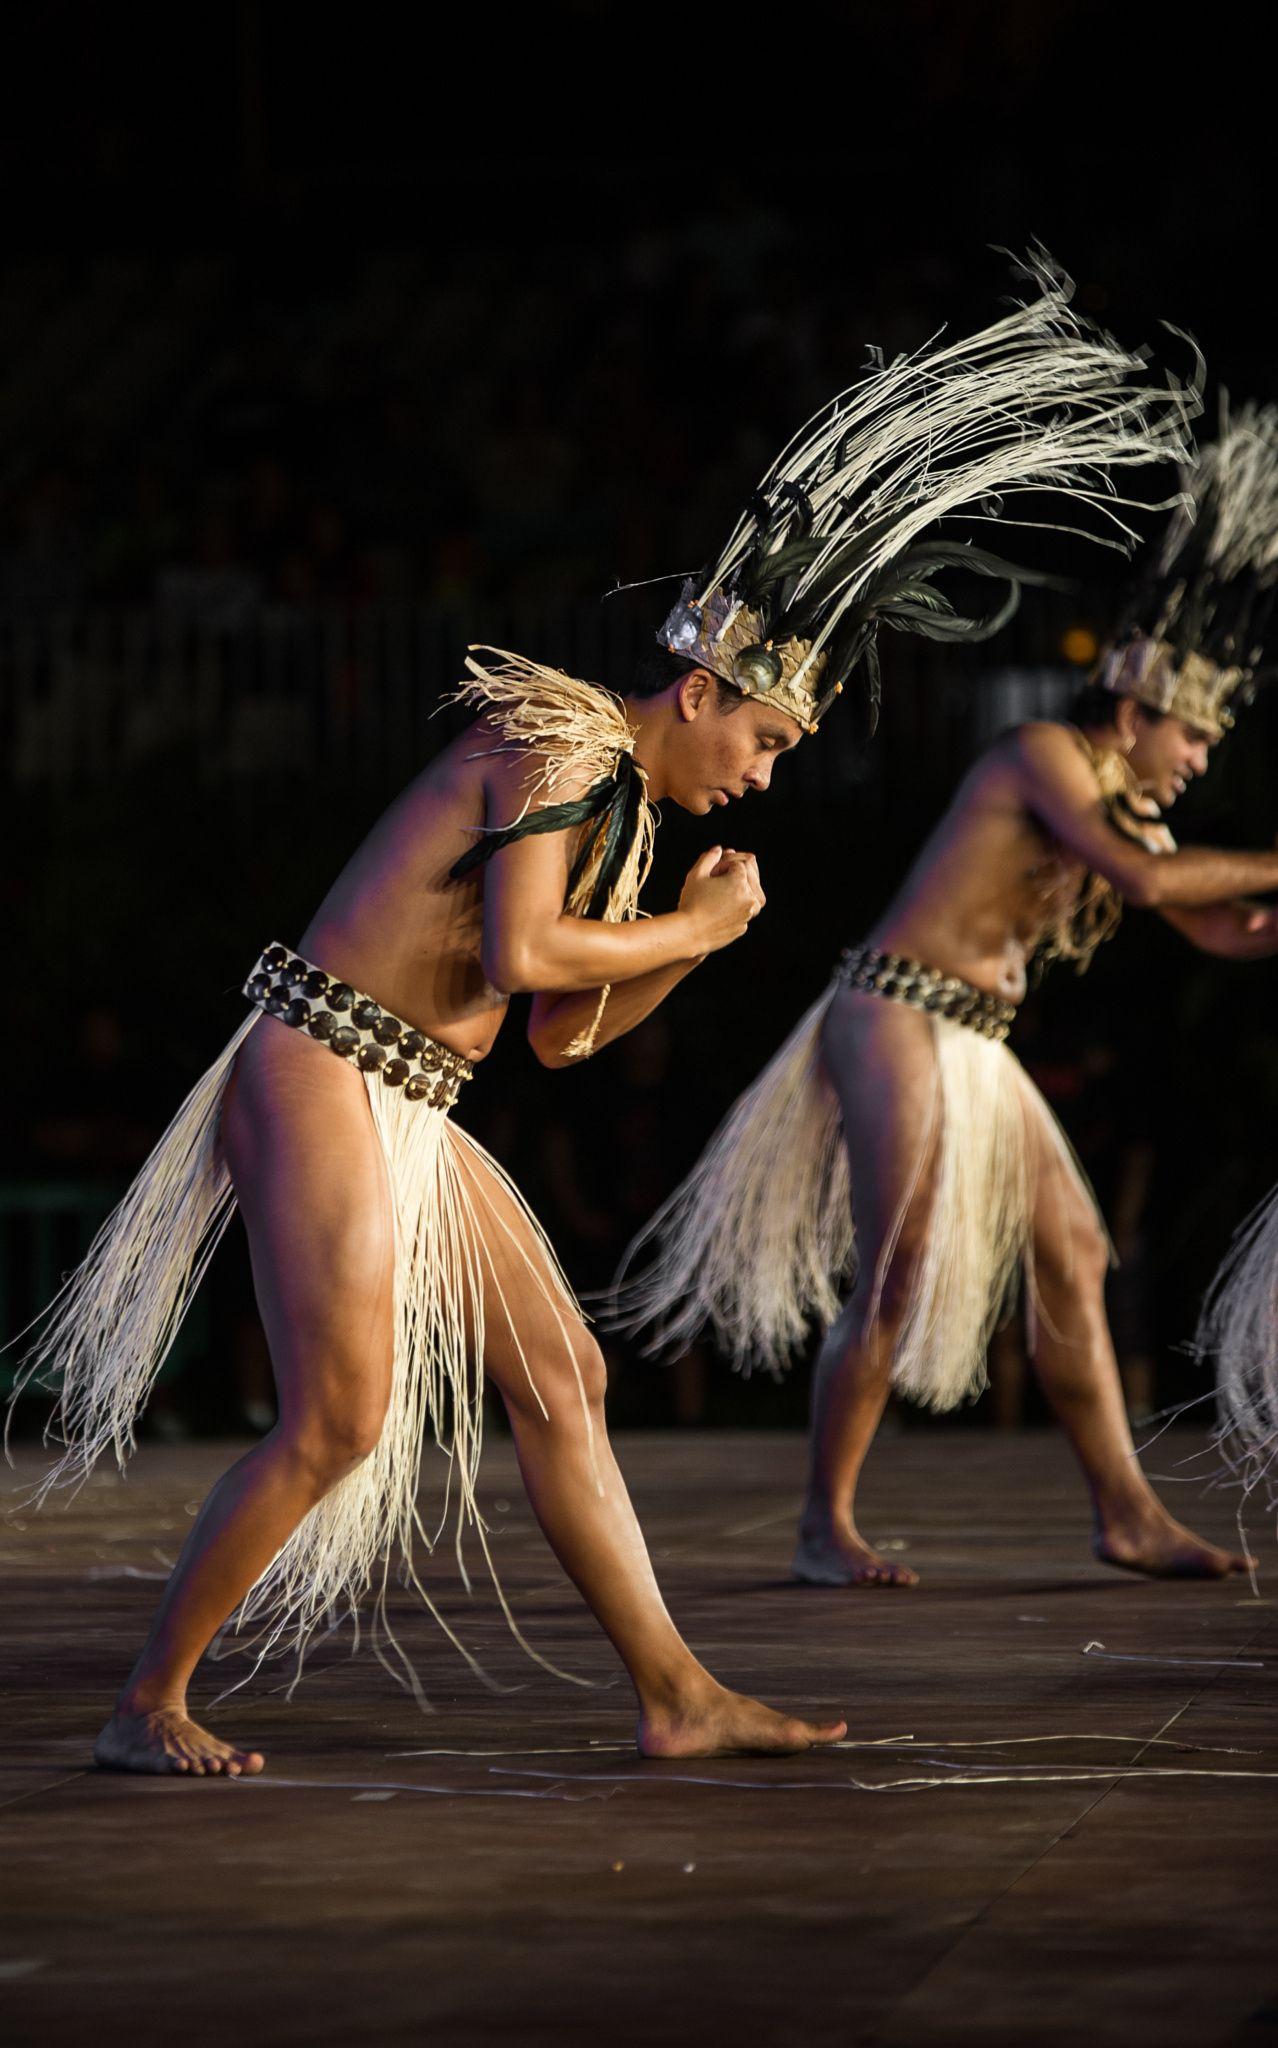 tahitian dancer - dancer performing during the heiva